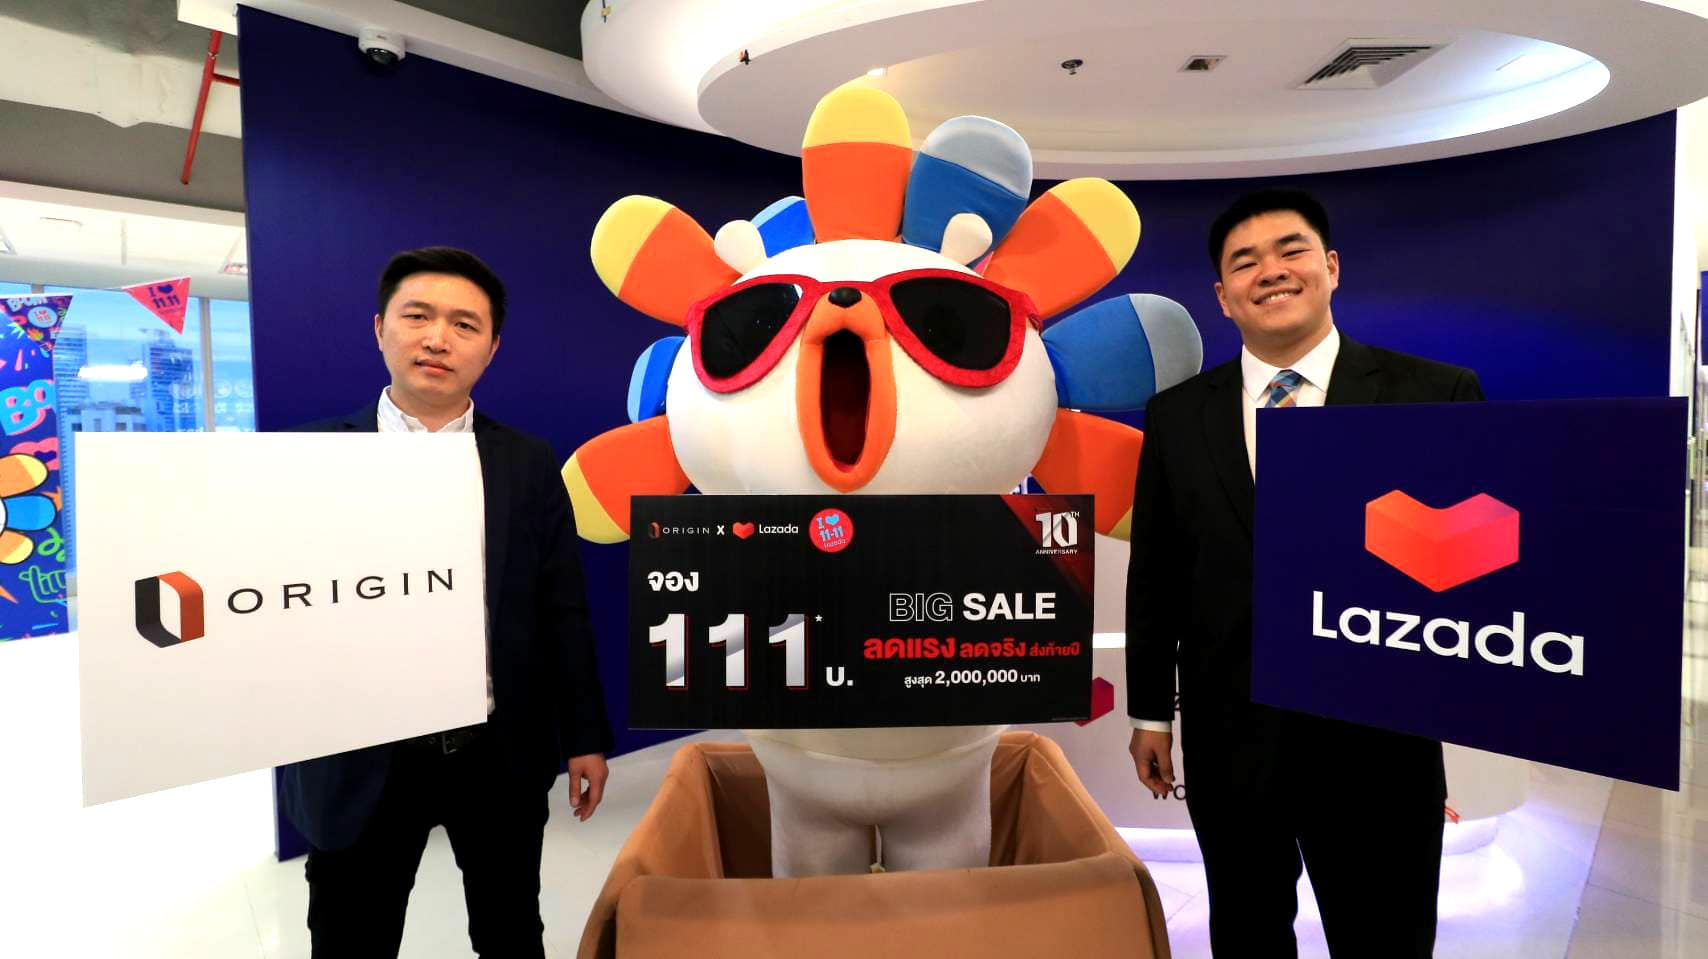 """Origin"" จับมือ ""LAZADA"" อัดโปรฯแรง จองคอนโดเพียง 111 บาท ผ่าน LazMall ปักหมุดวันที่ 11 เดือน 11"